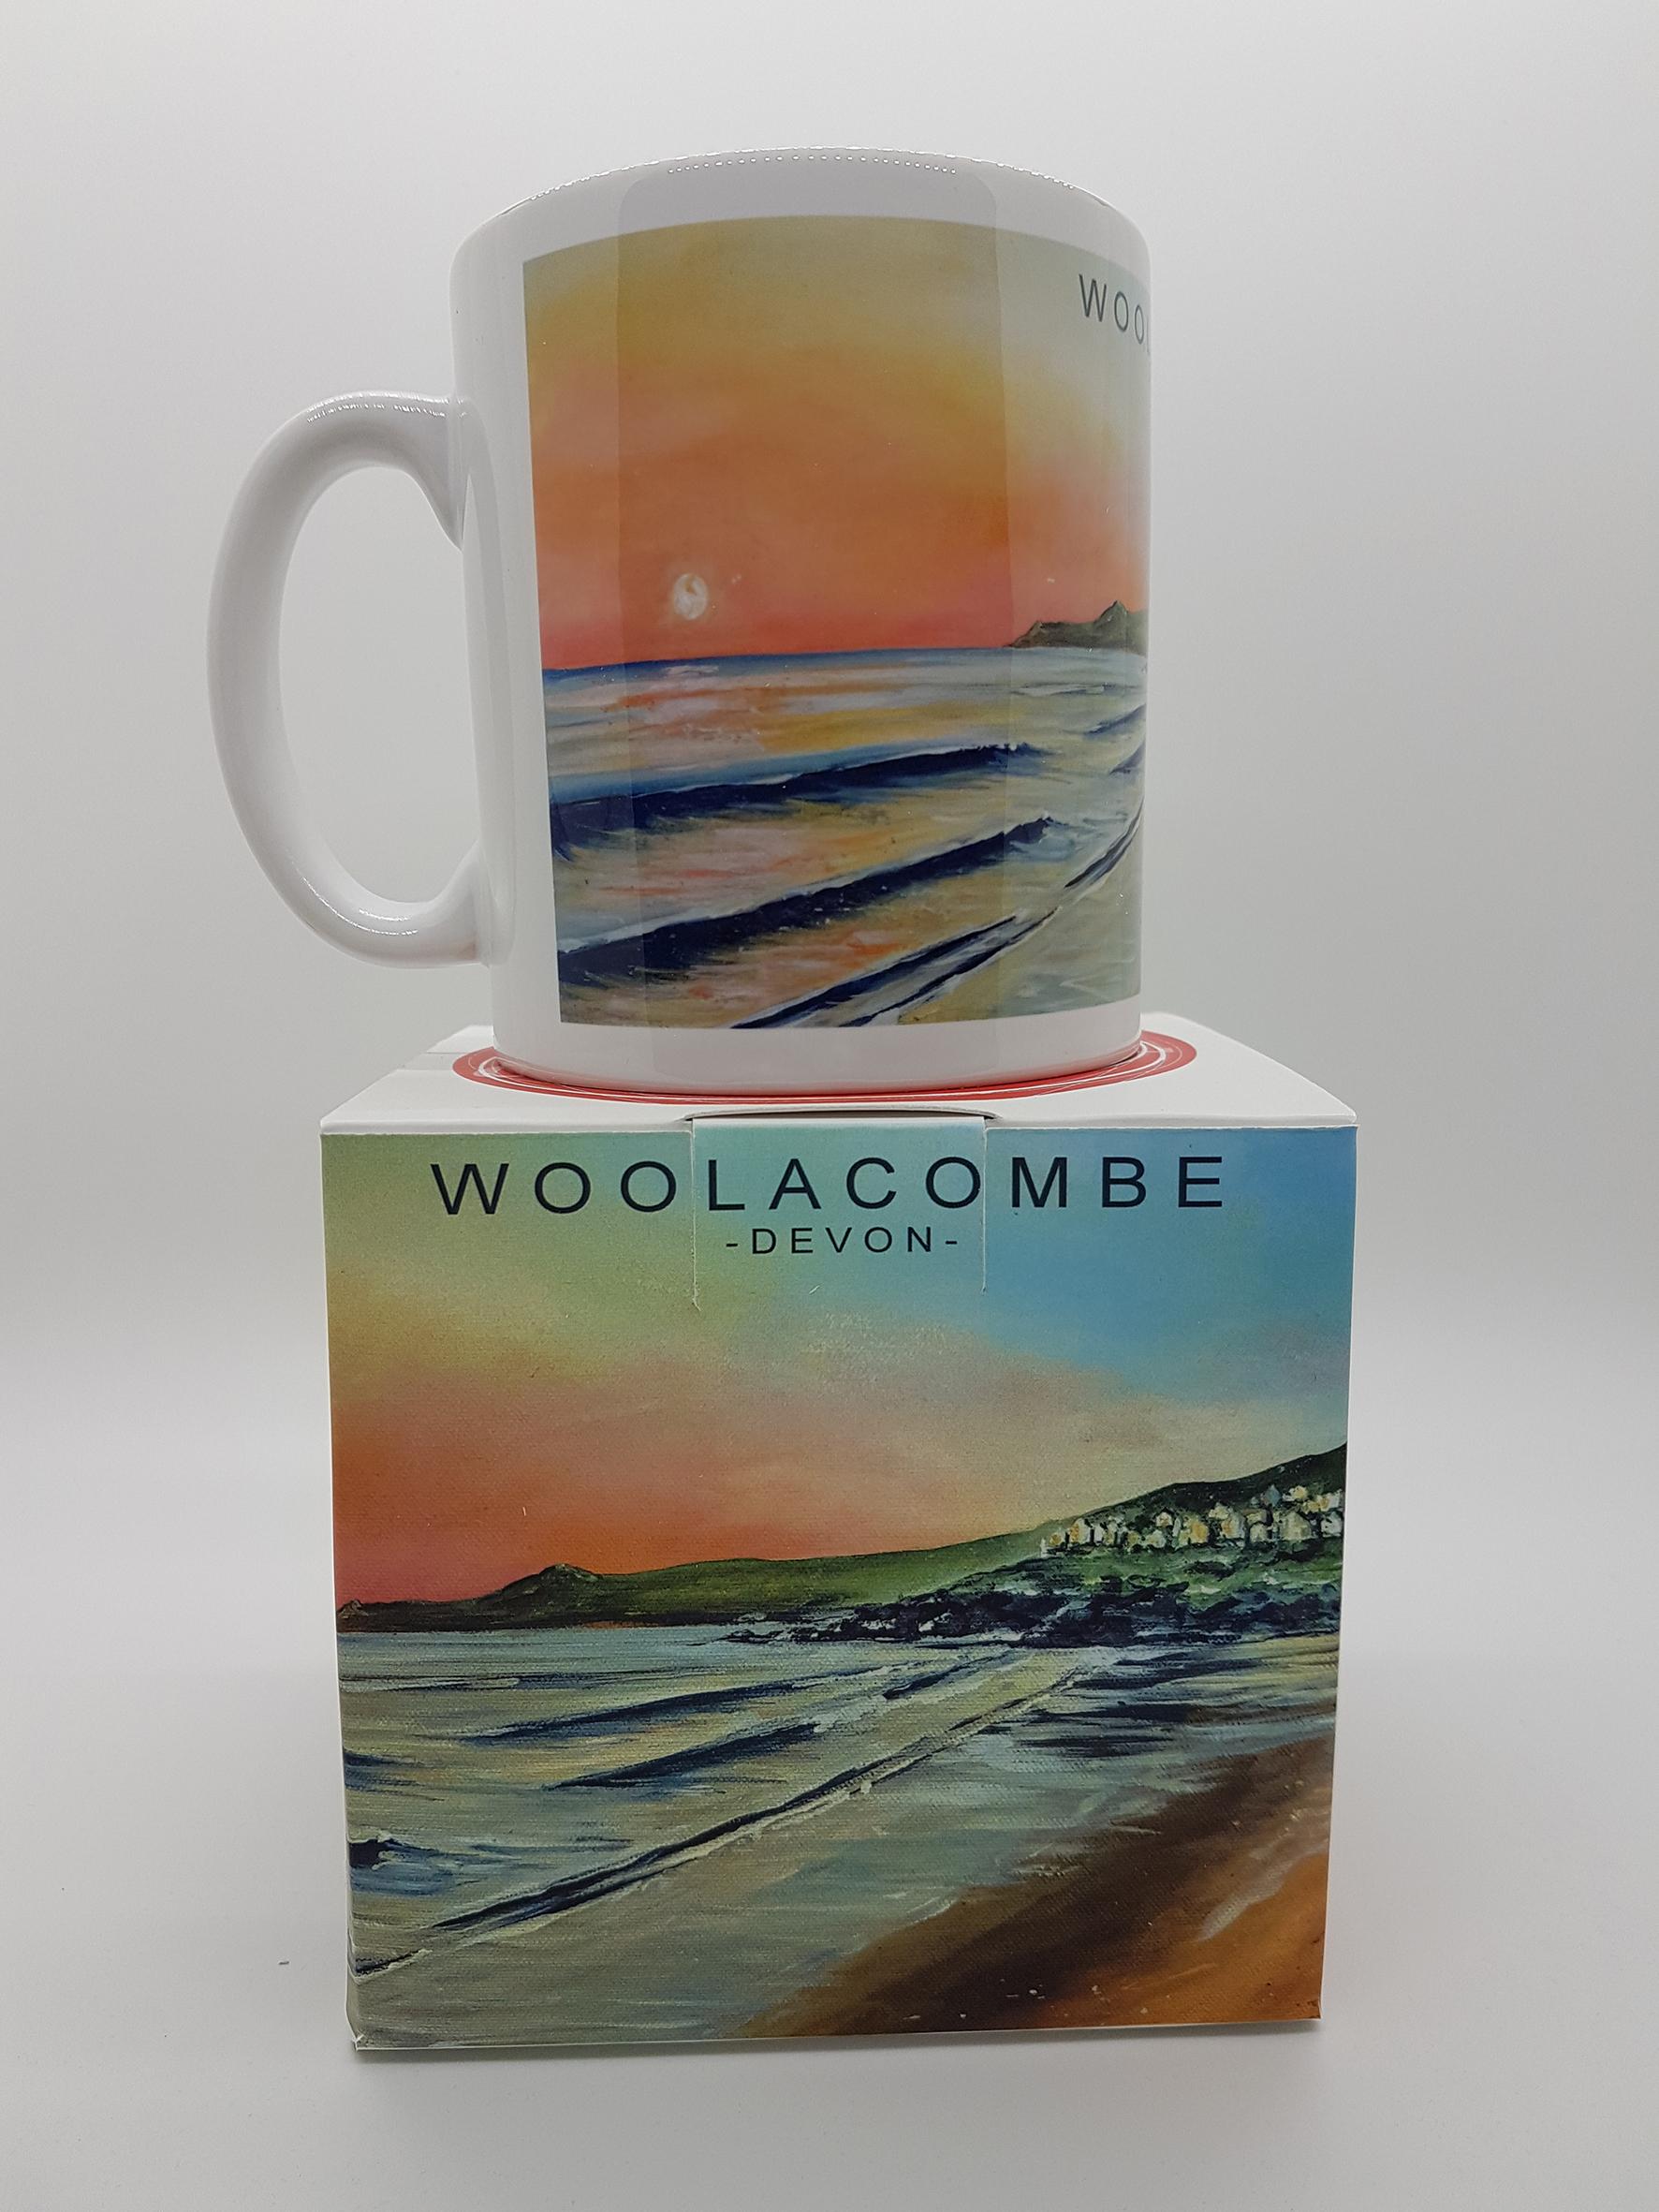 mug featuring Woolacombe beach huts at sunset